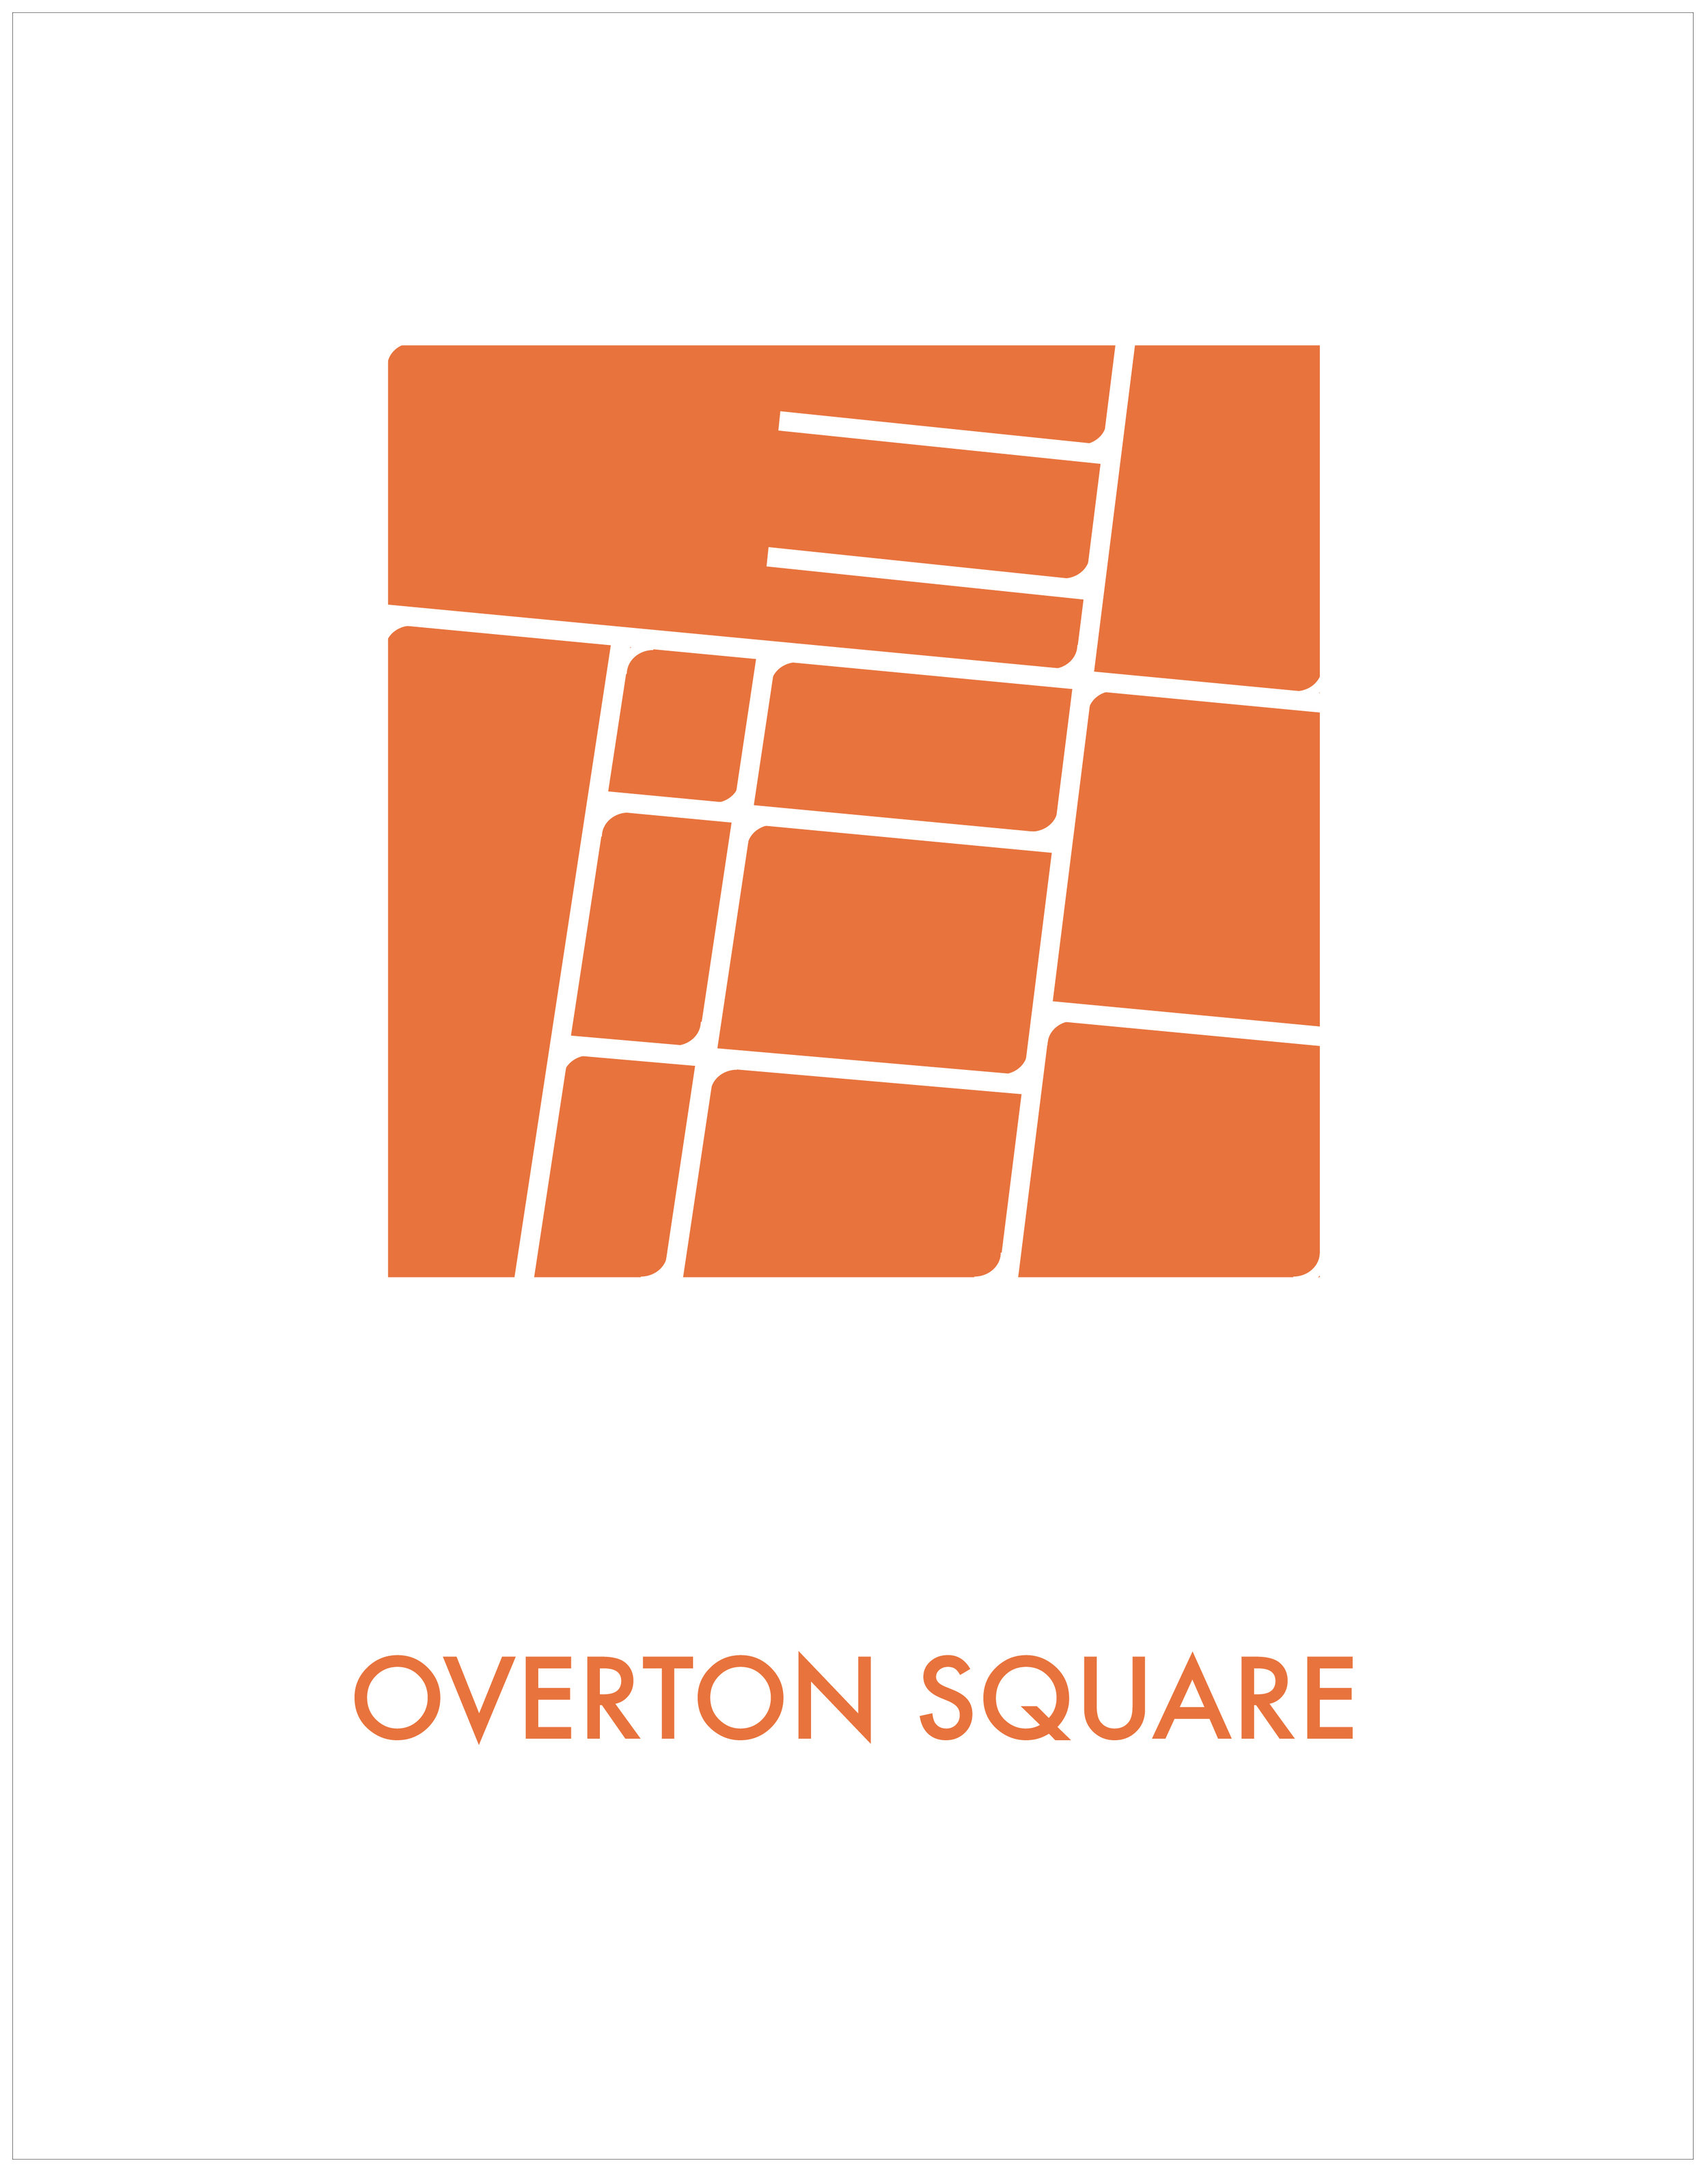 overton square.jpg